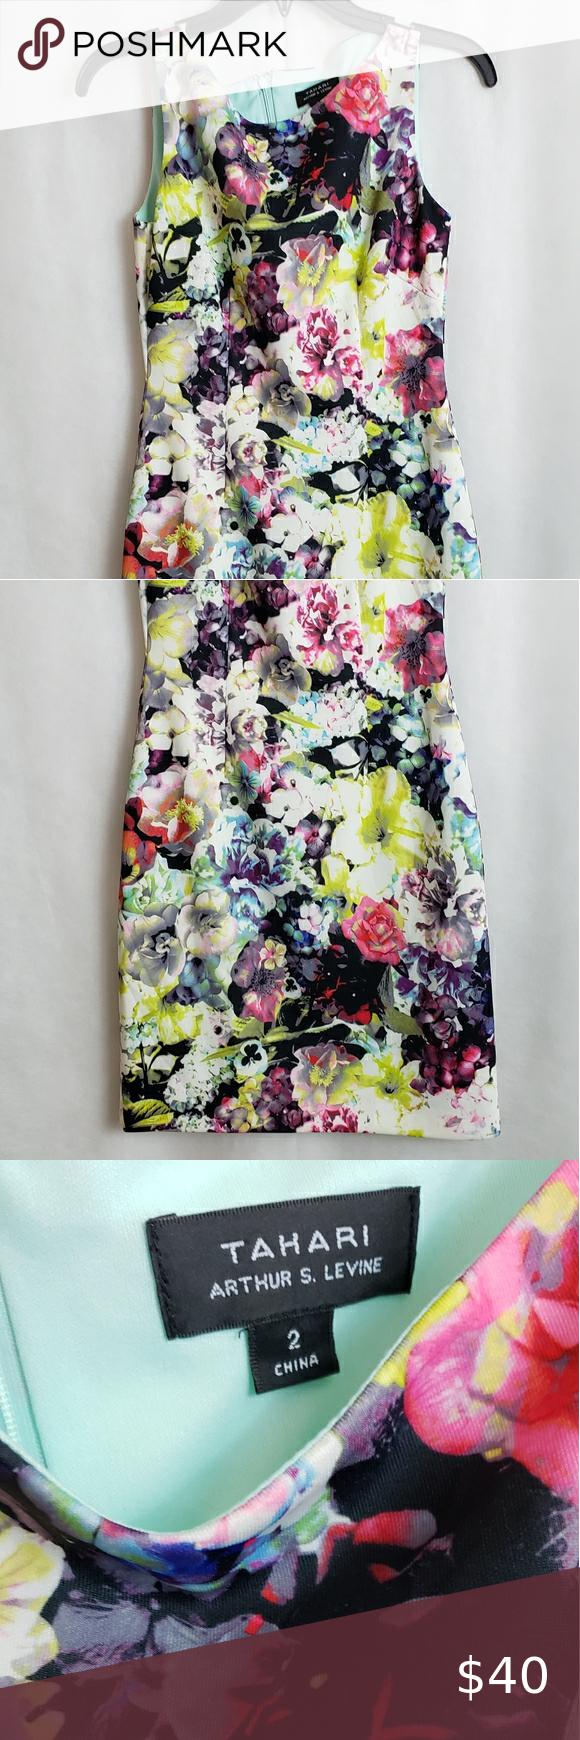 Tahari by  Arthur Levine  Multicolor Floral Sheath Look fabulous wearing thisT...#arthur #fabulous #floral #levine #multicolor #sheath #tahari #thist #wearing